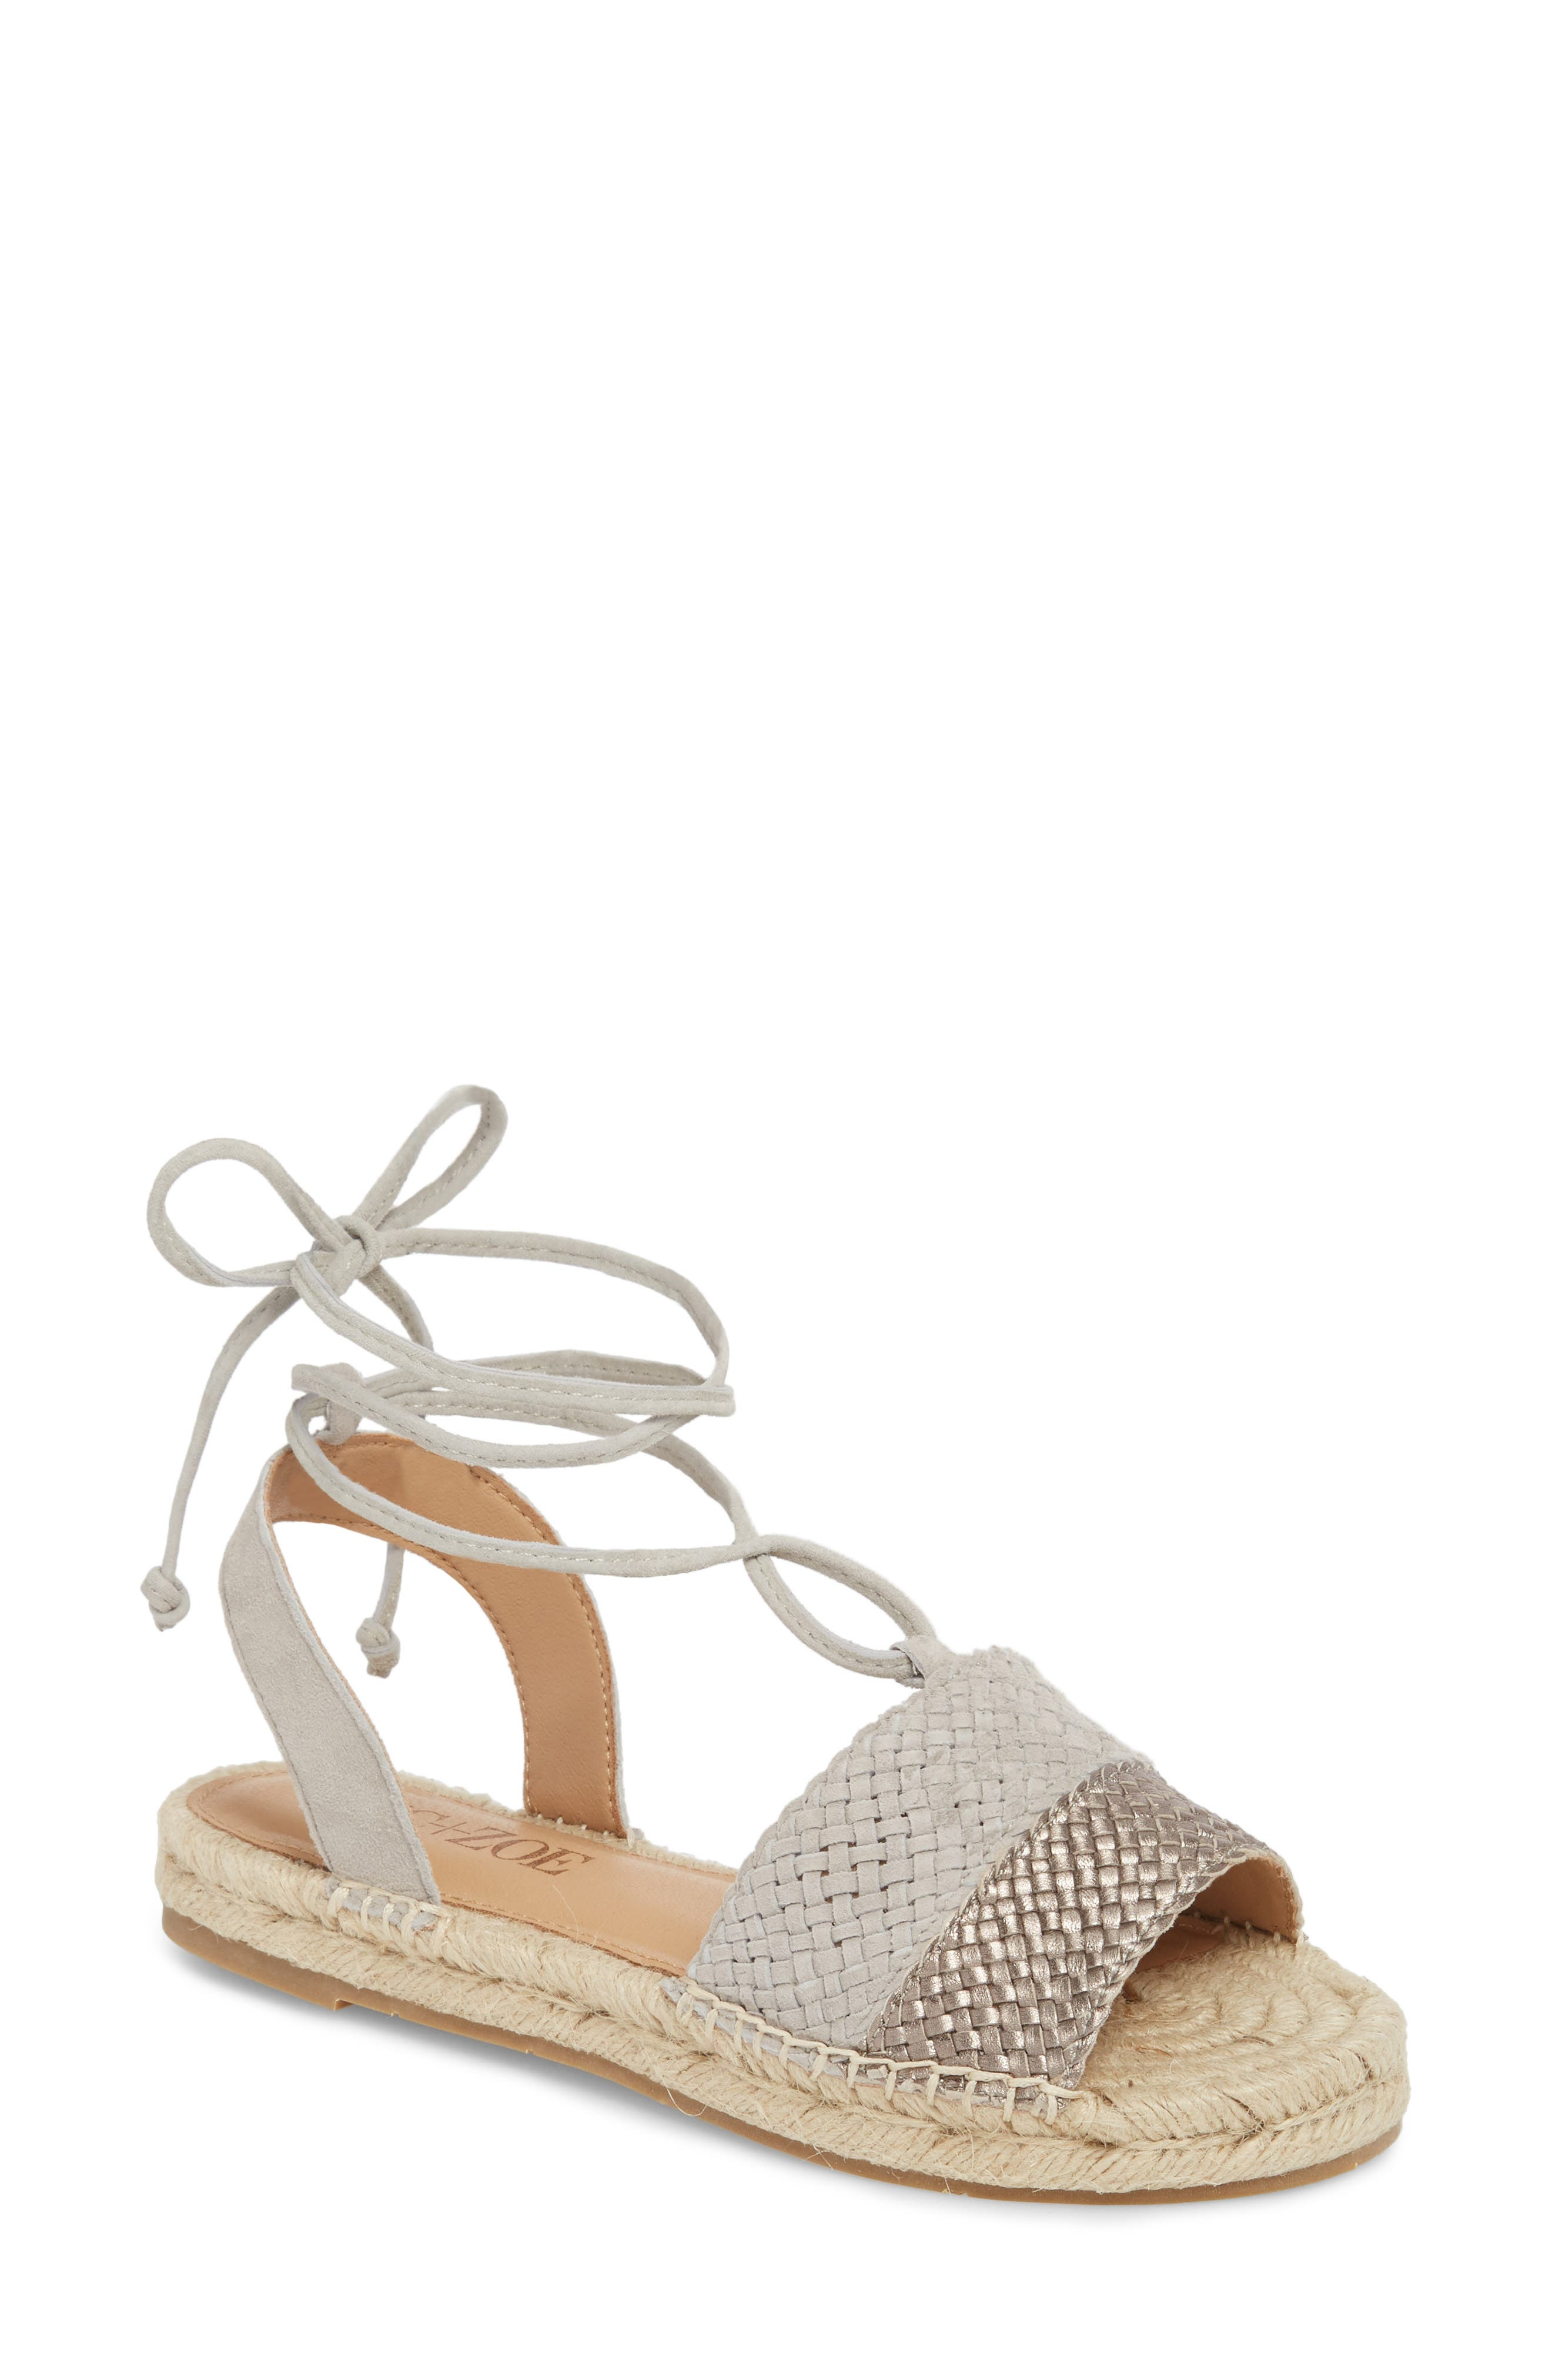 Eliza Ankle Wrap Espadrille Sandal,                             Main thumbnail 1, color,                             Pewter/ French Linen